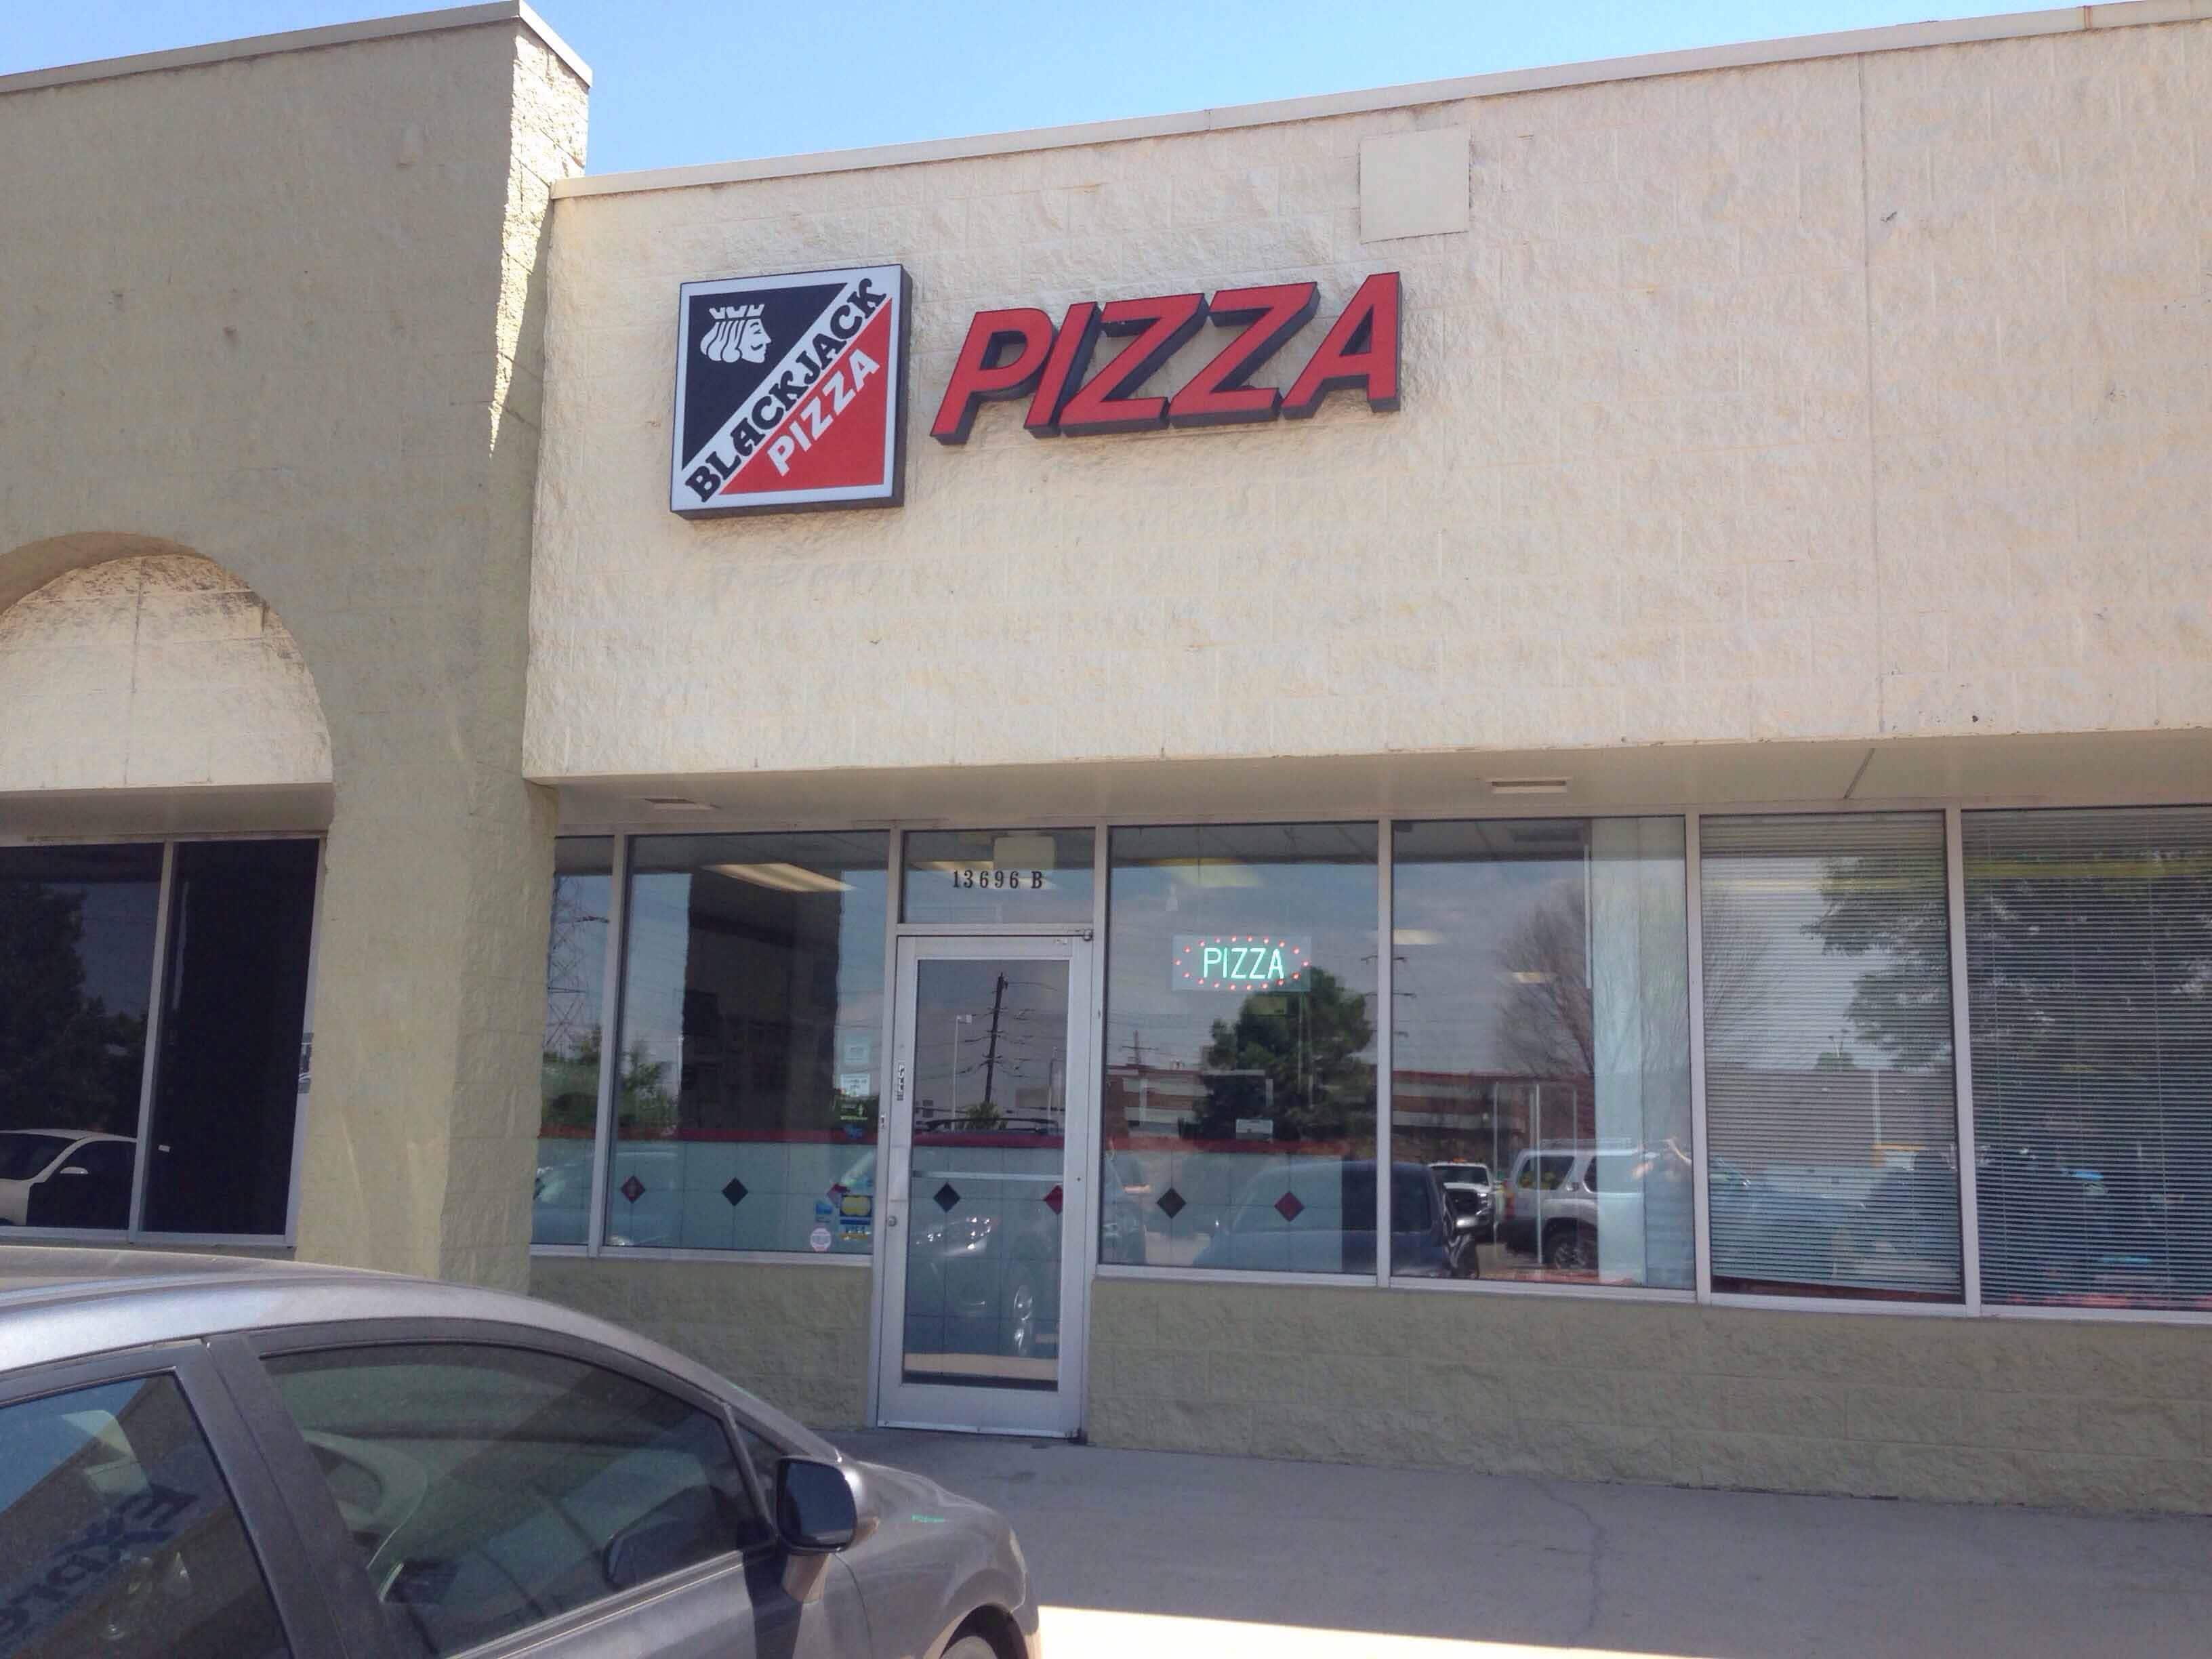 Blackjack pizza aurora colorado top gambling destinations in the world